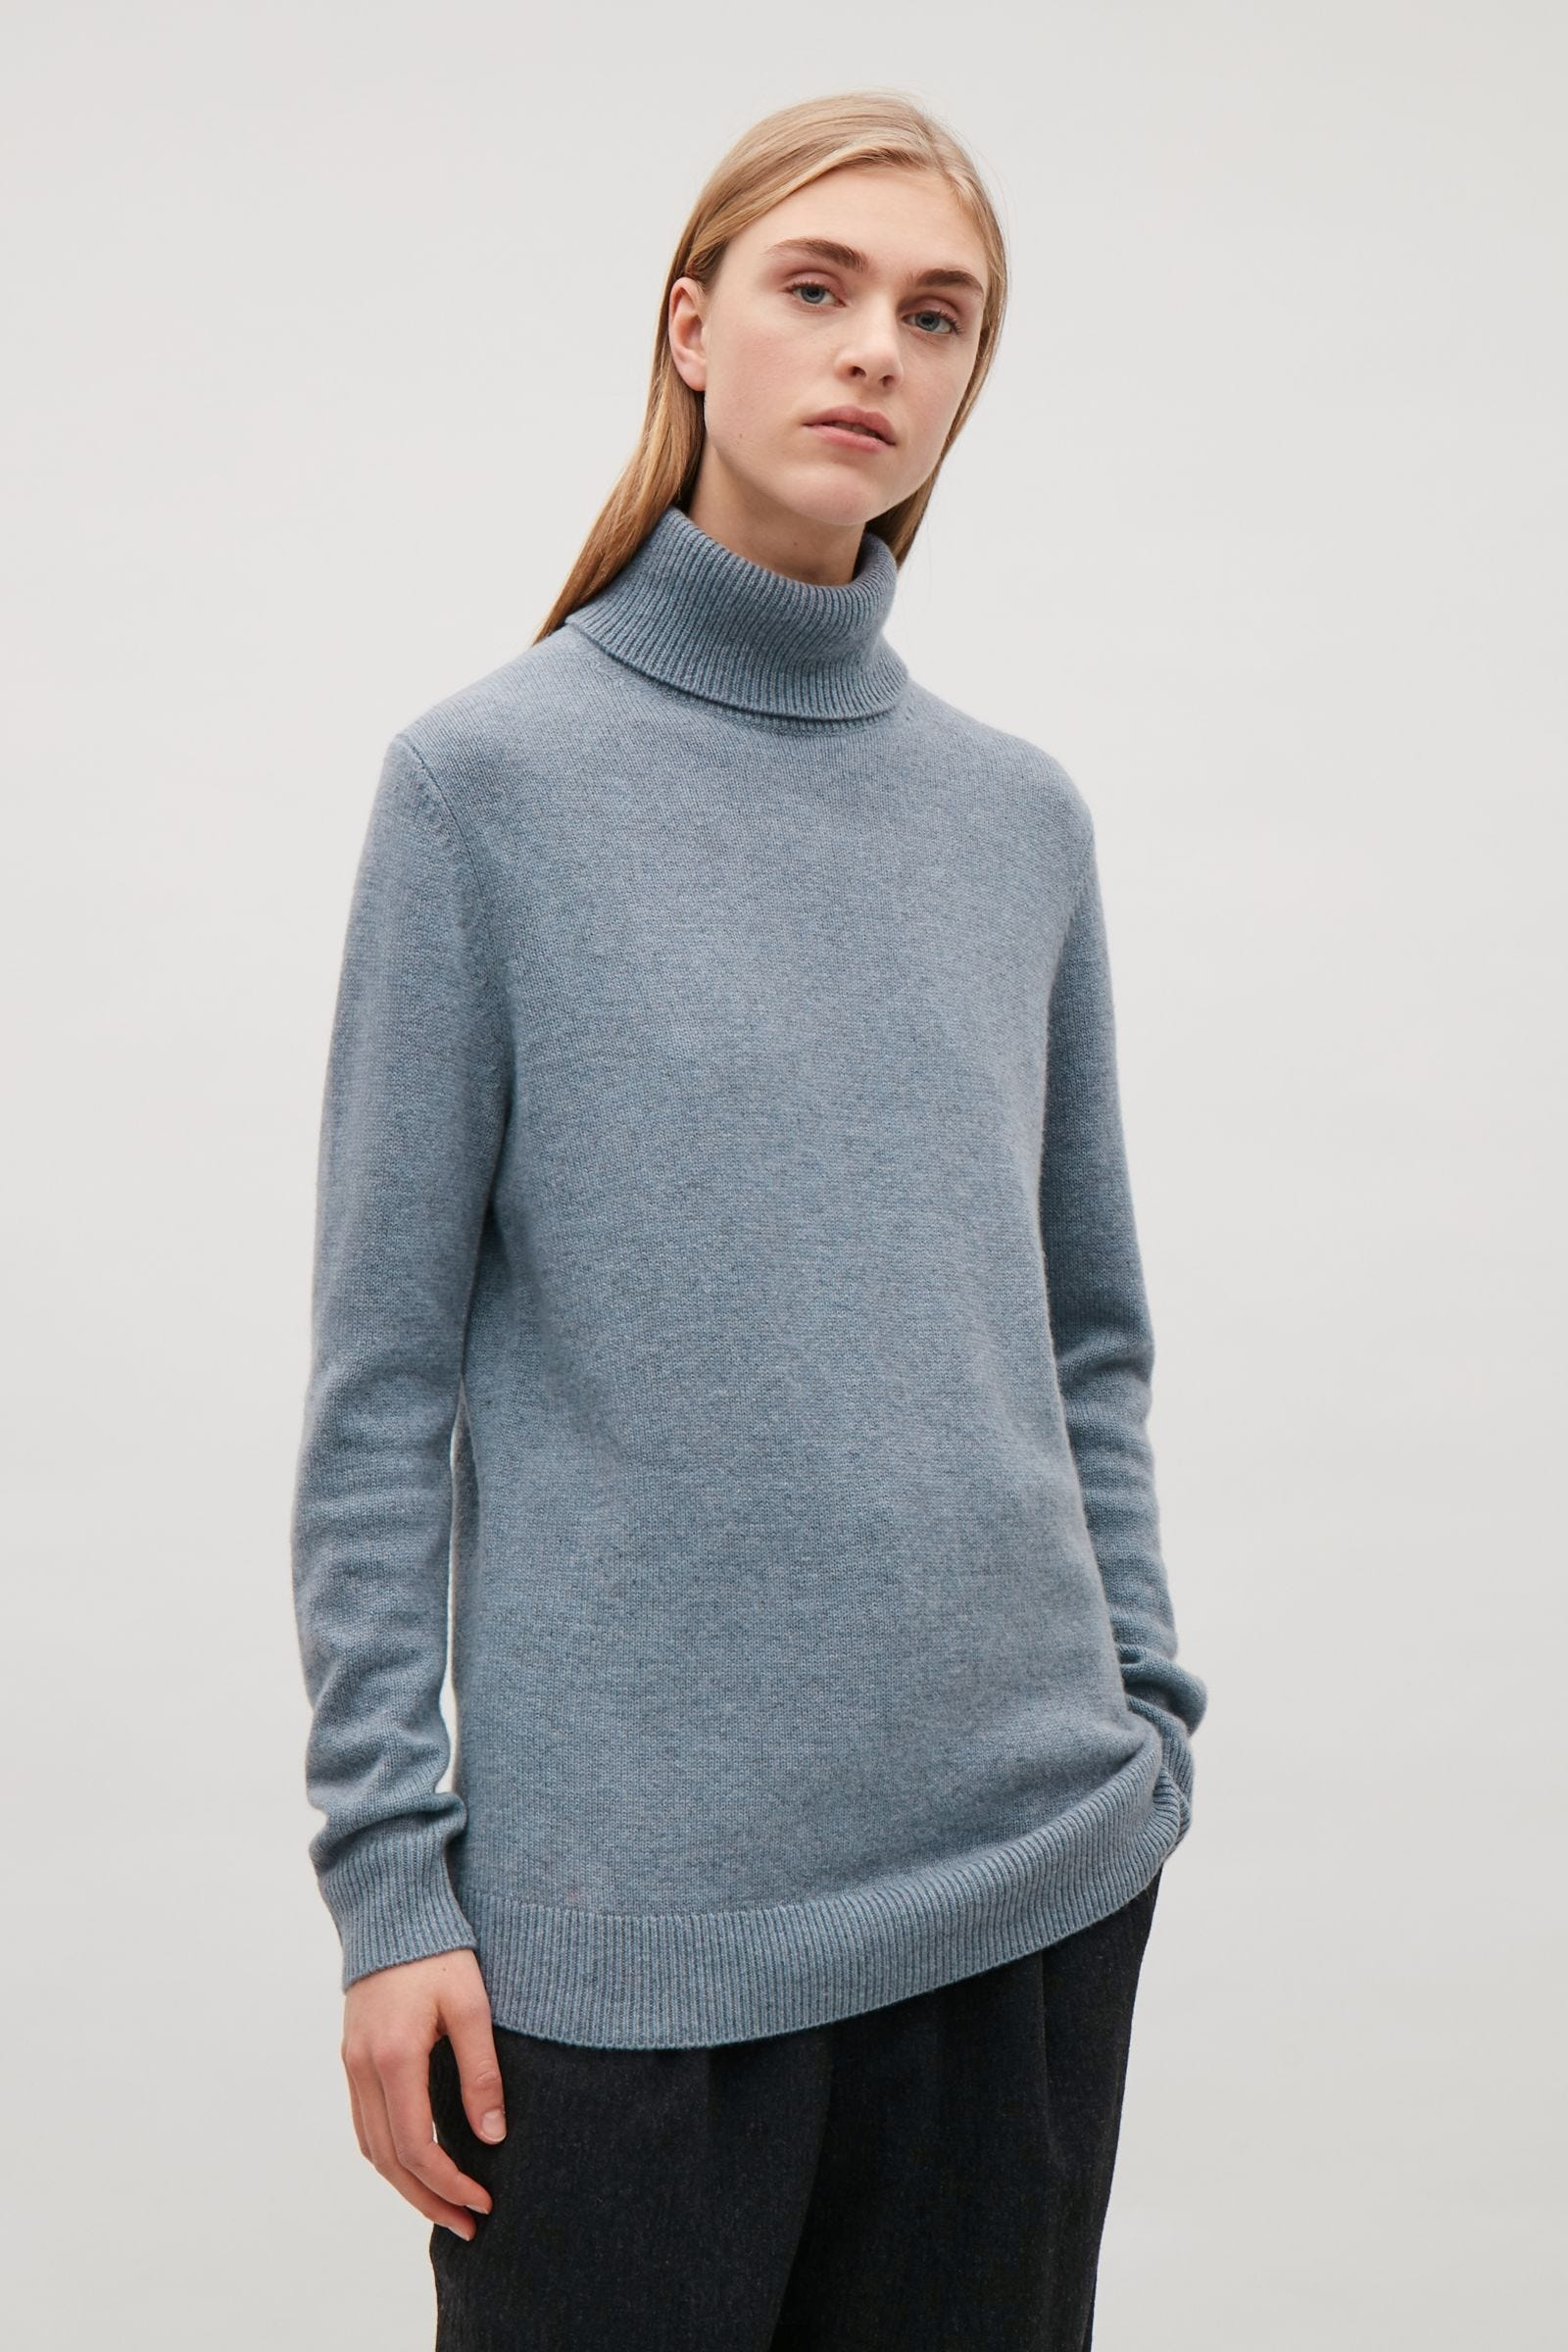 Cute Knit Sweaters For Winter, Oversized, Cozy Warm